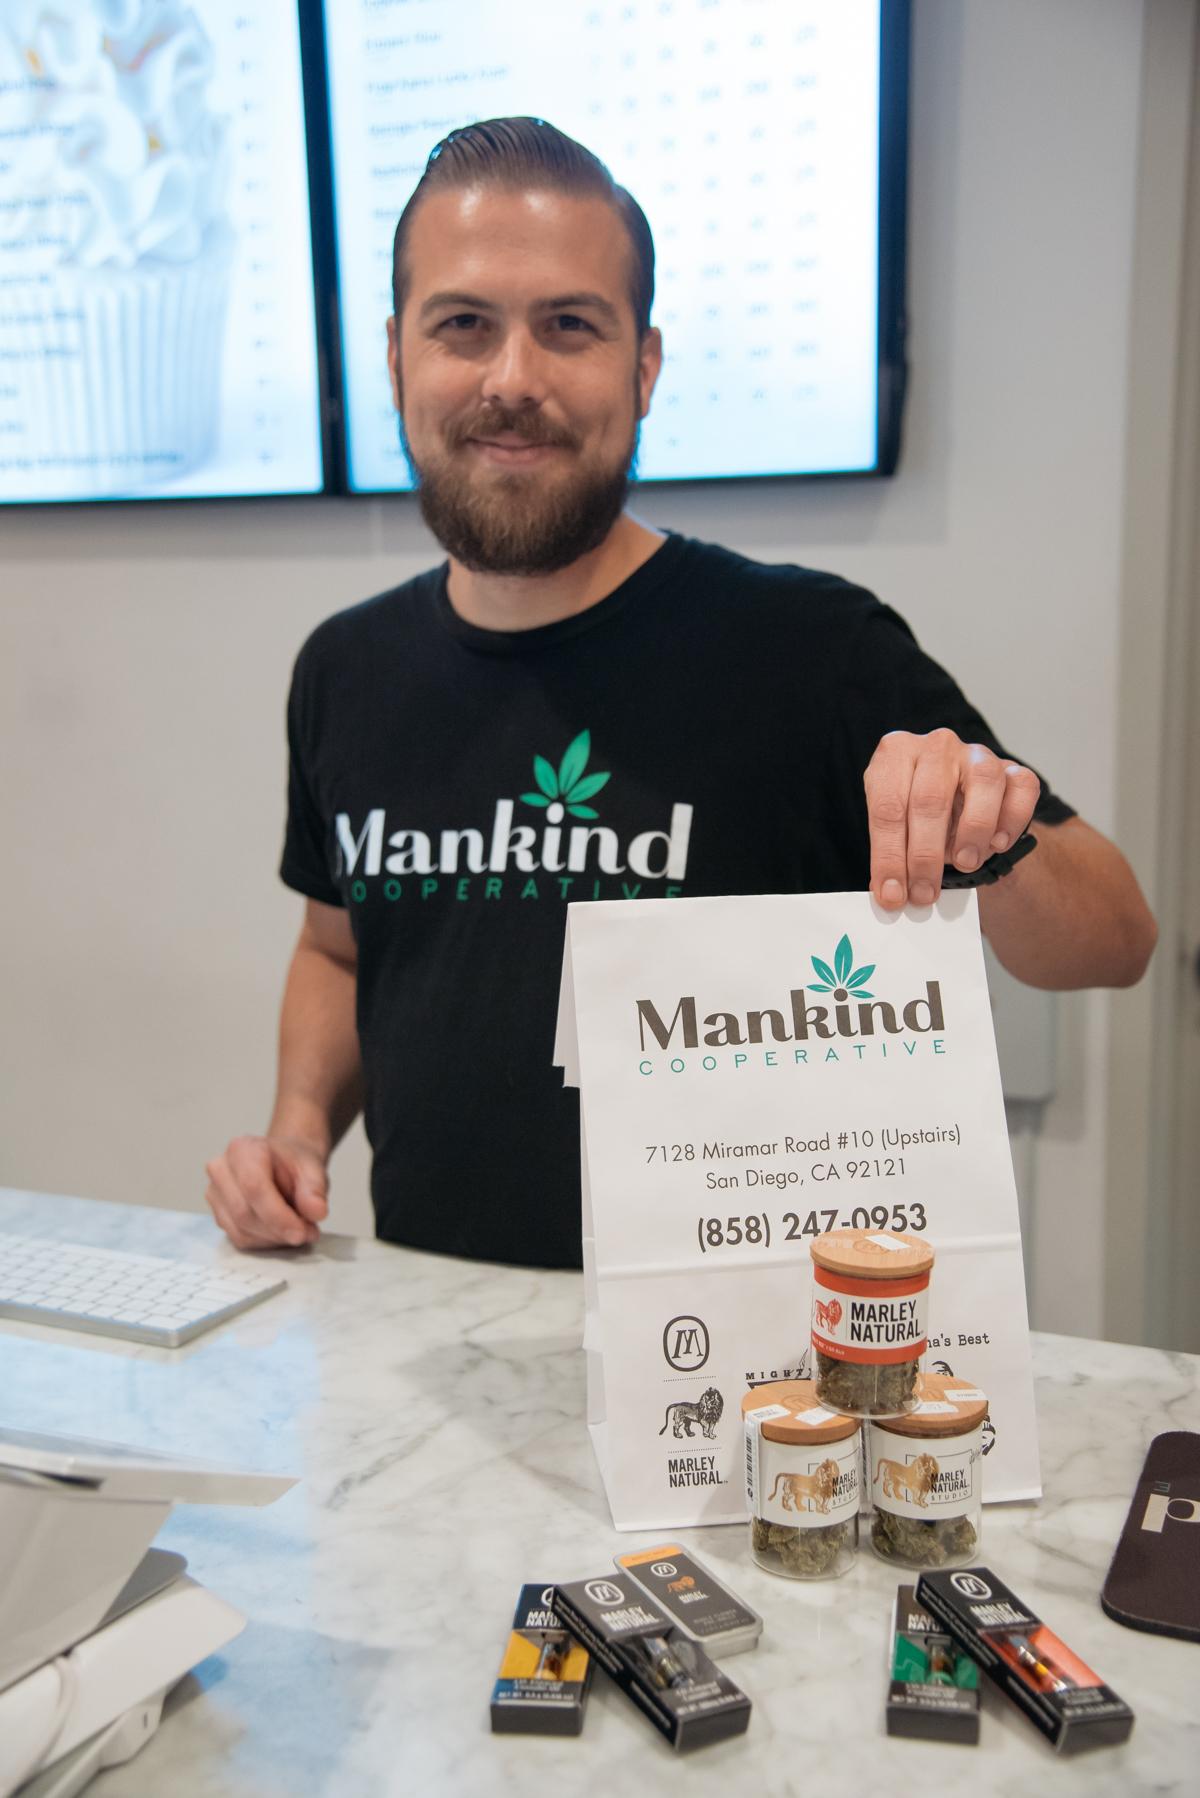 mankind-cooperative-san-diego-marley-natural-9.jpg